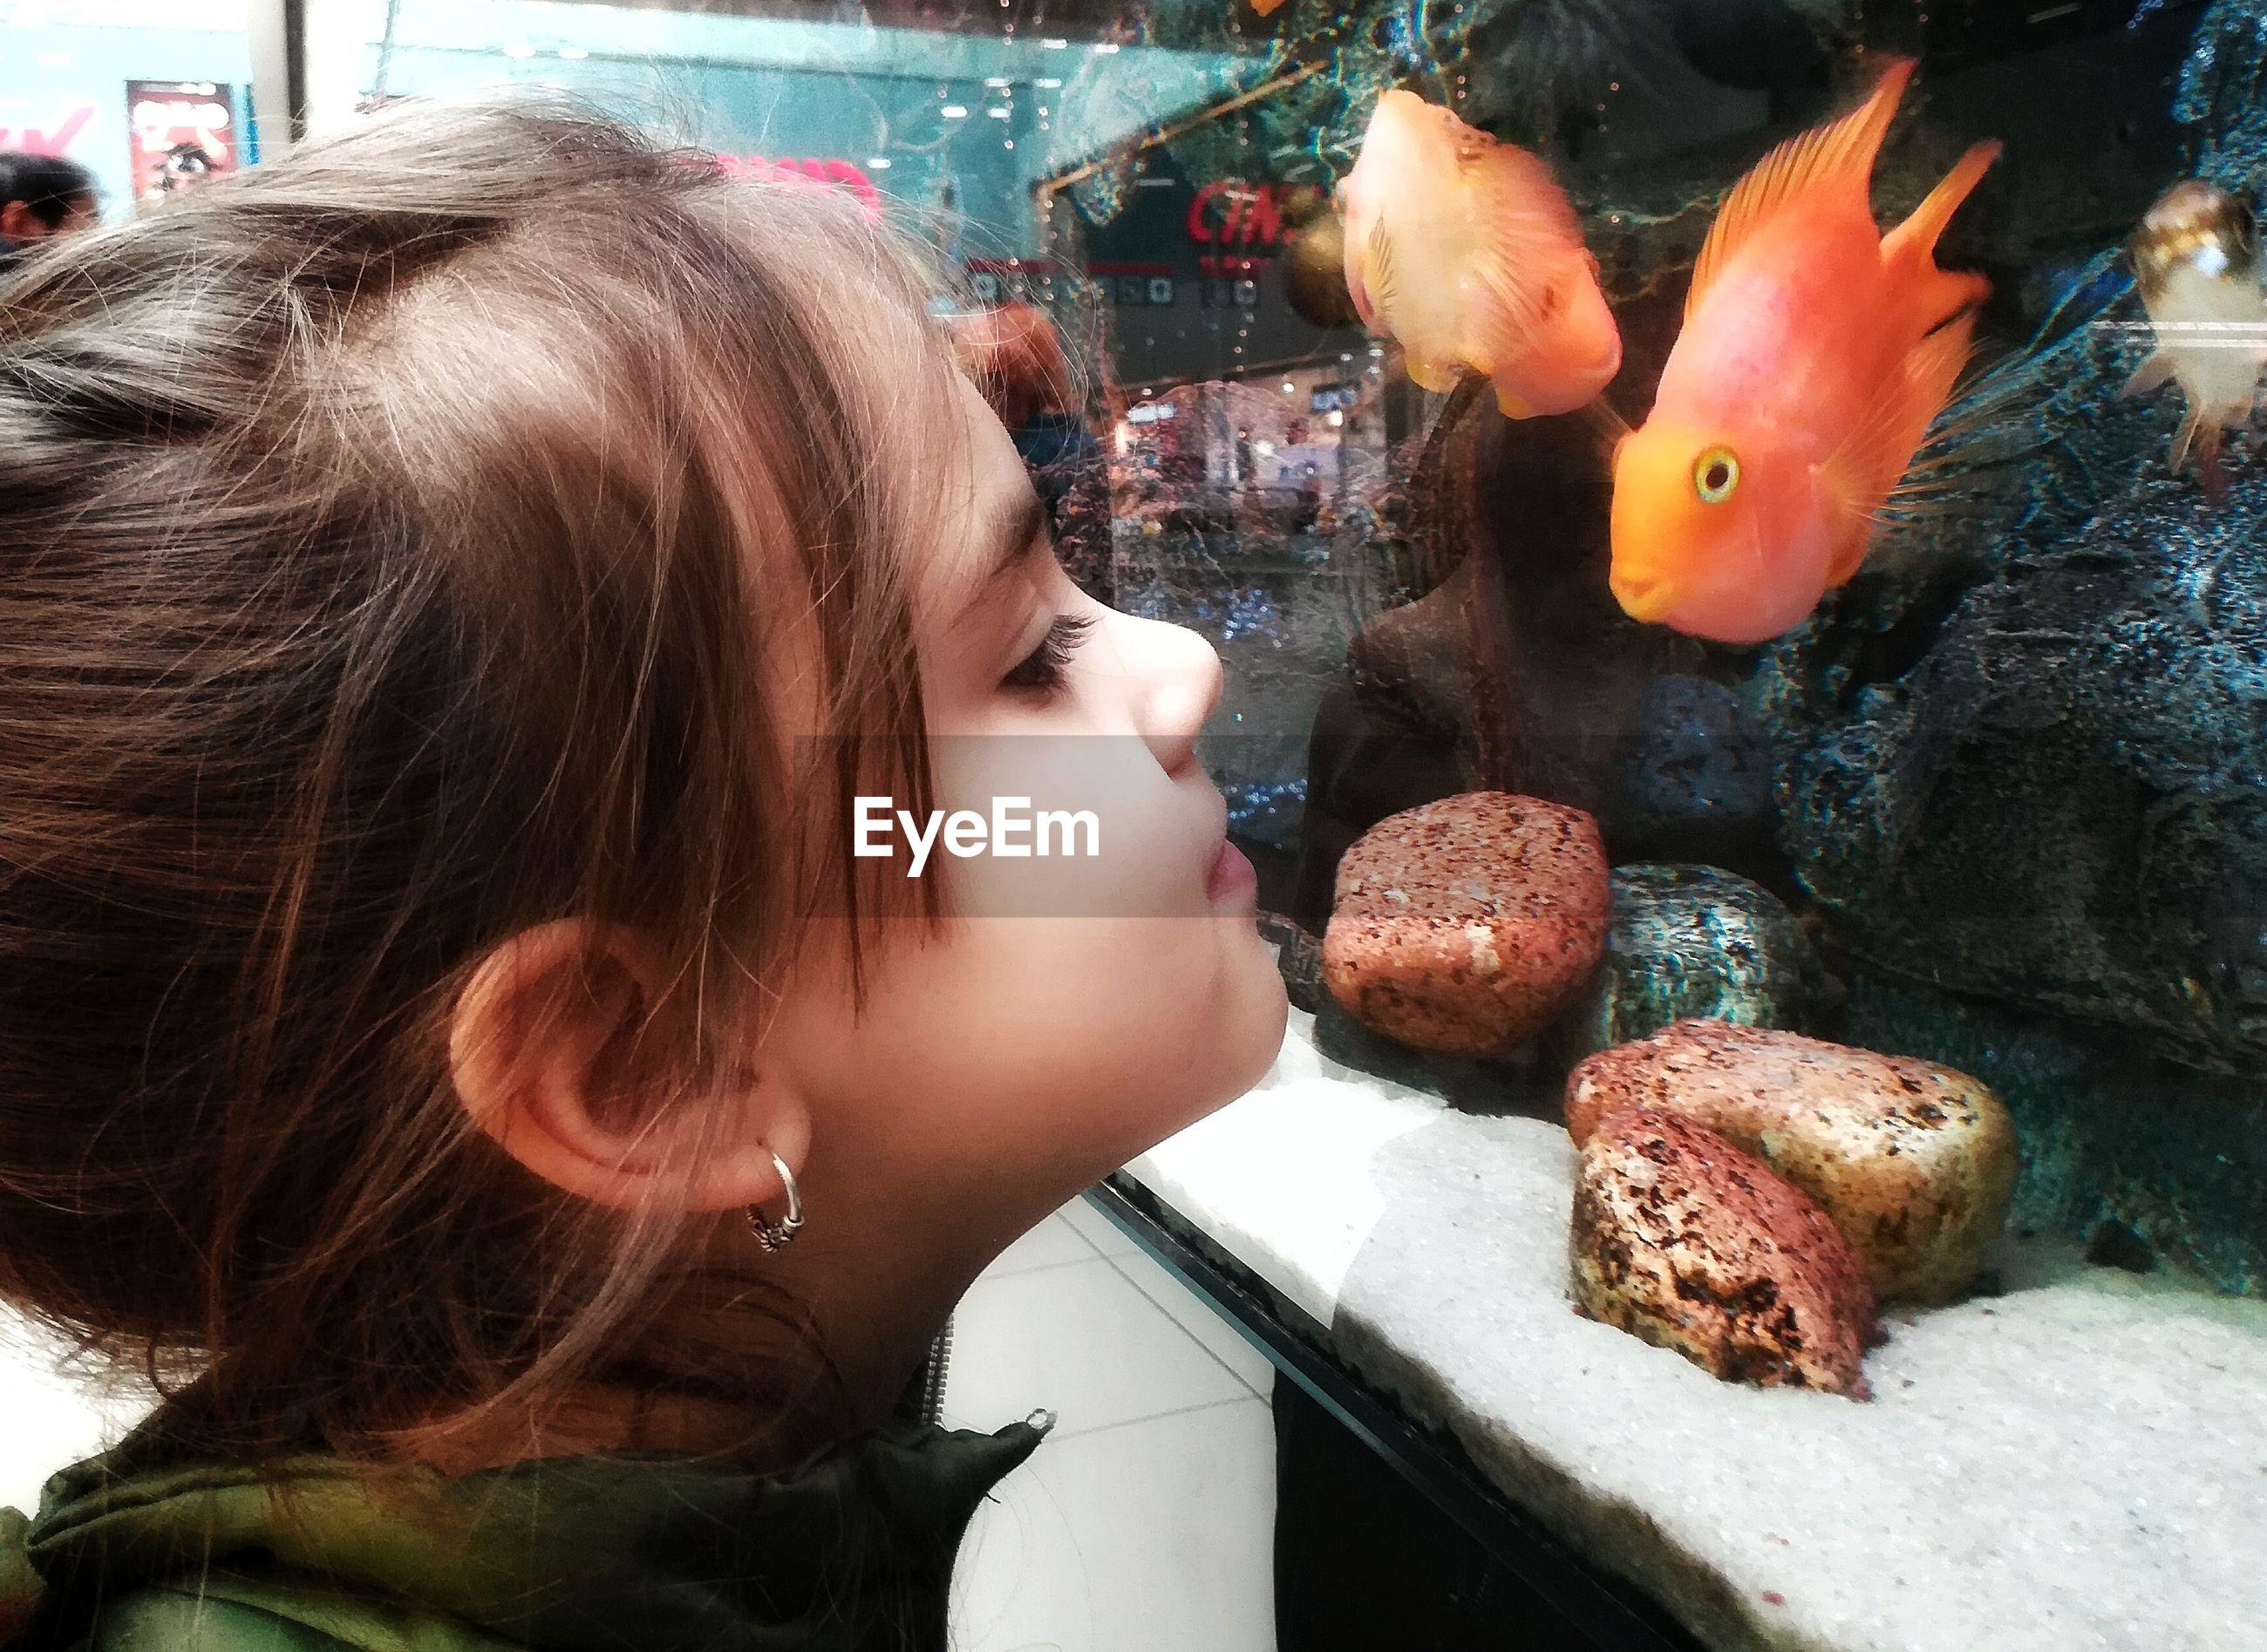 CLOSE-UP OF GIRL LOOKING AT WATER